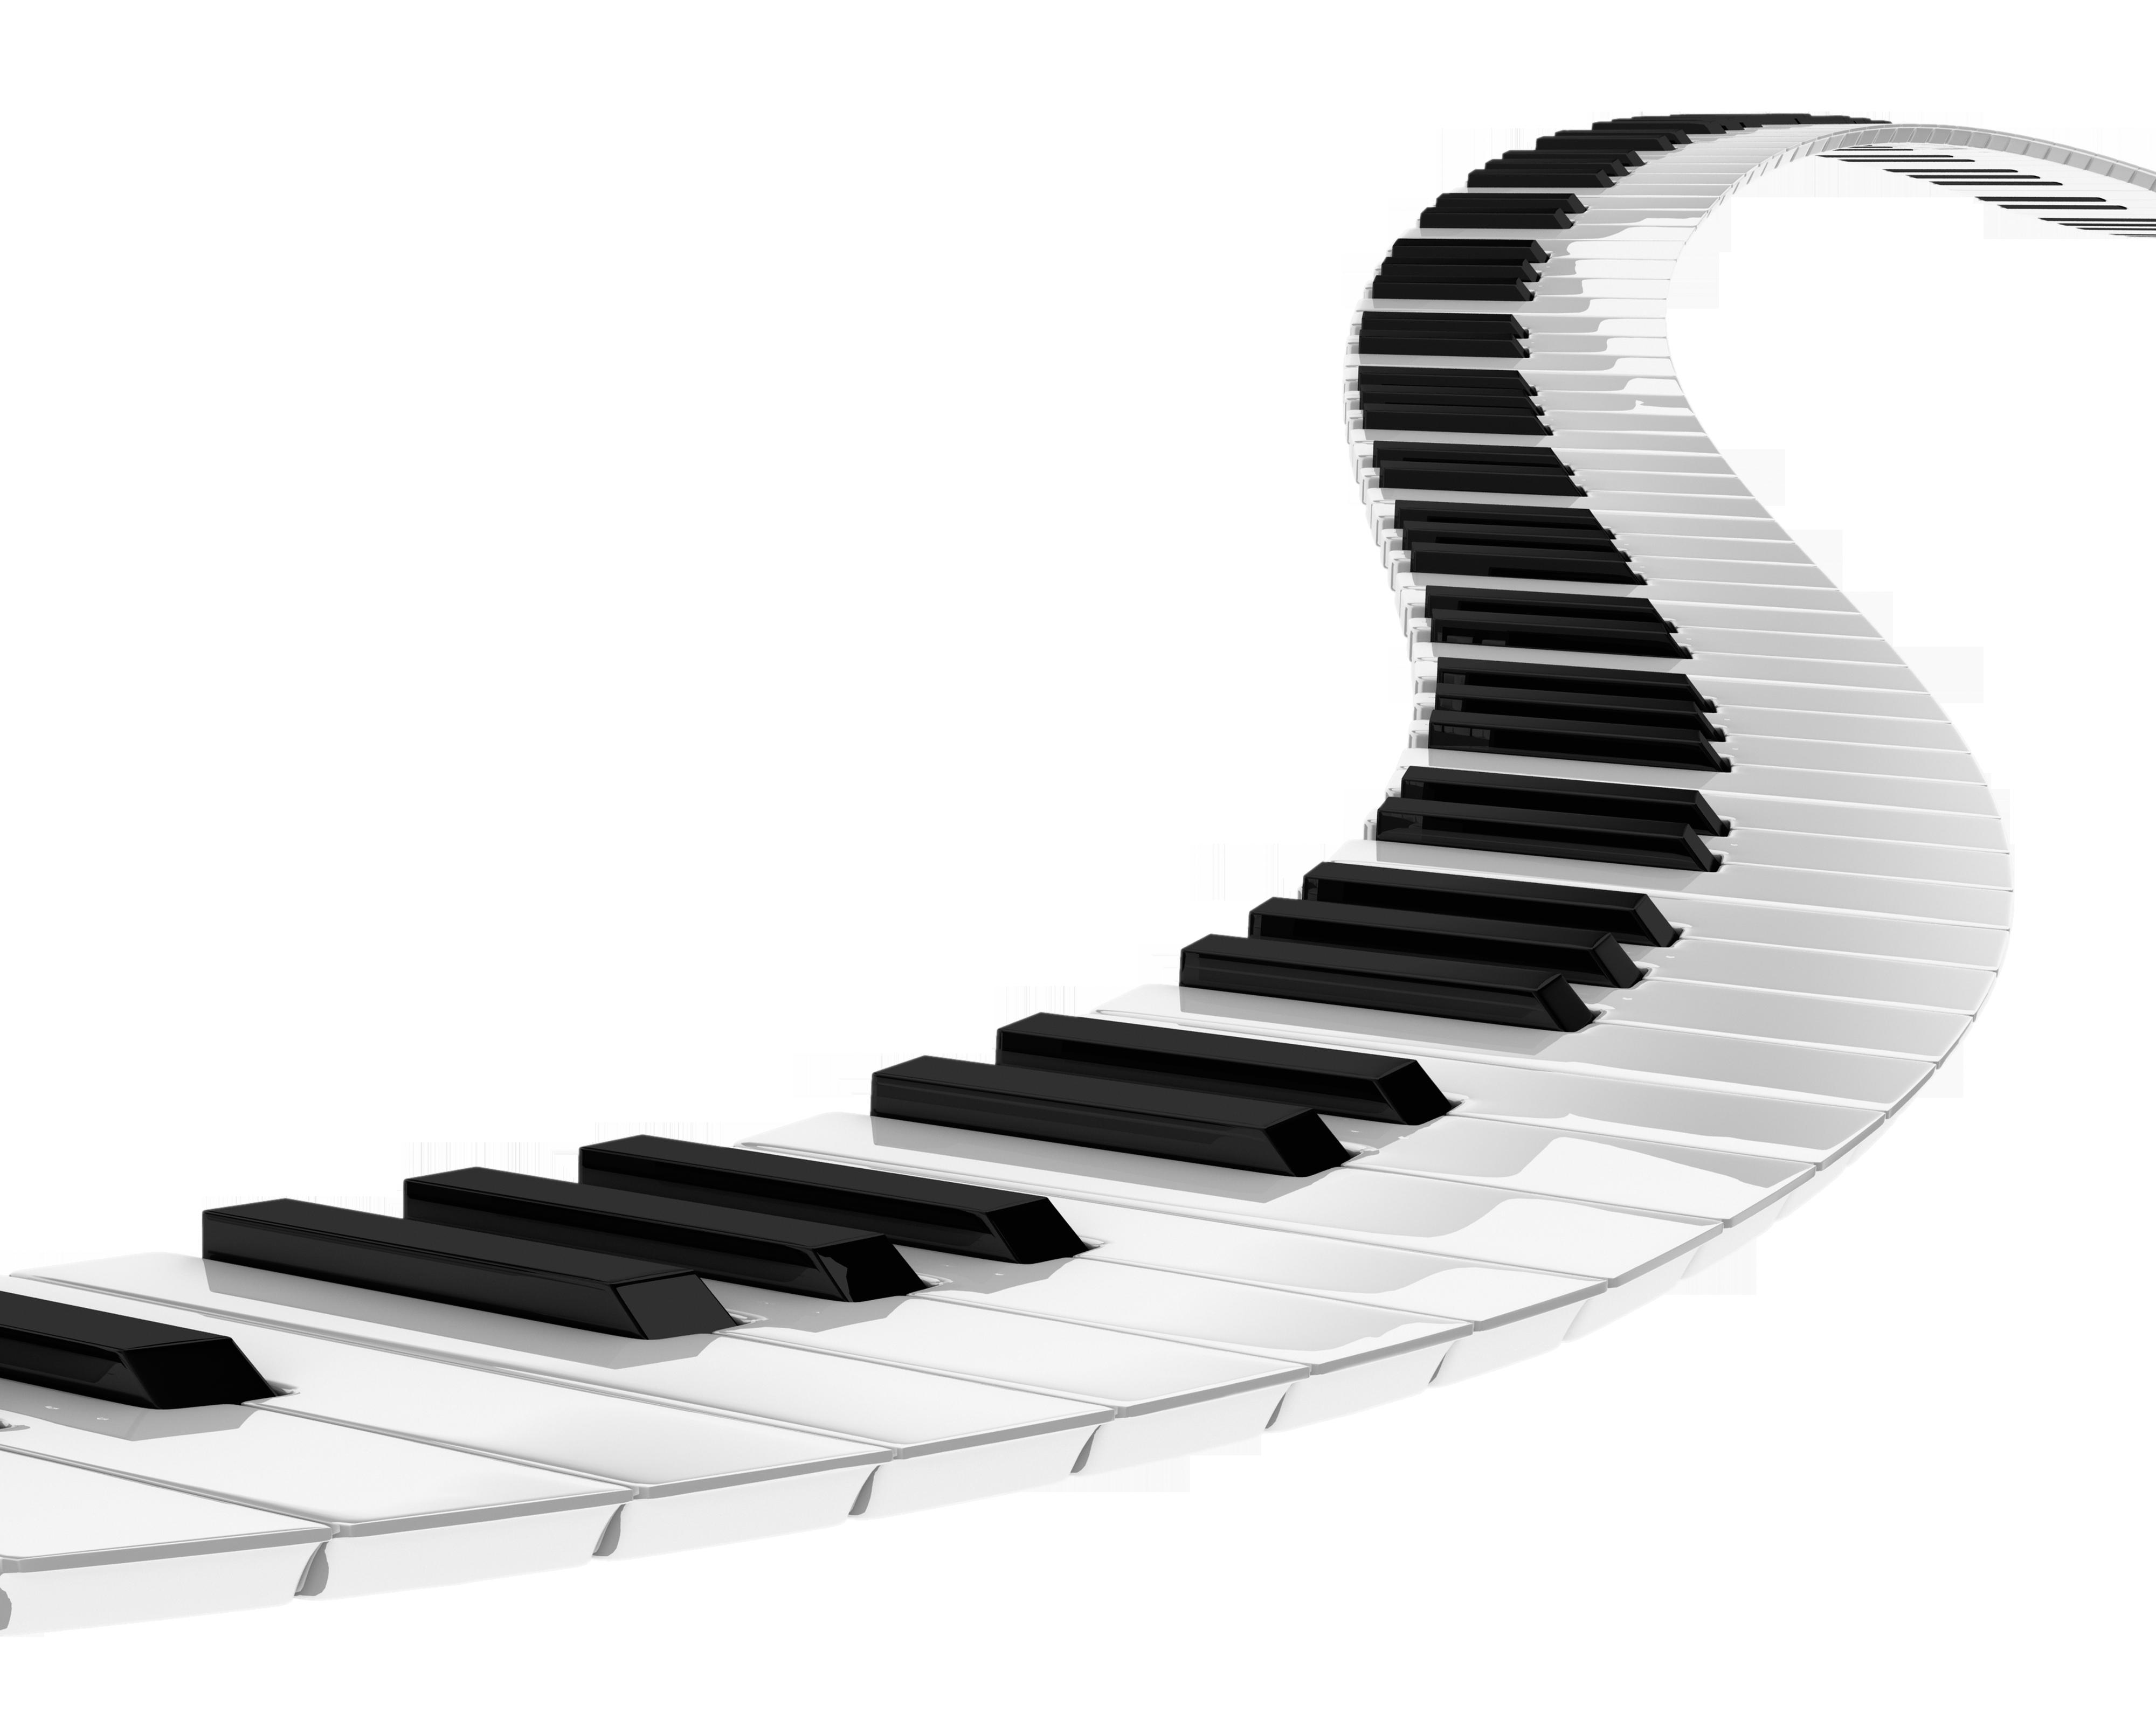 Music Keyboard PNG HD - 139675